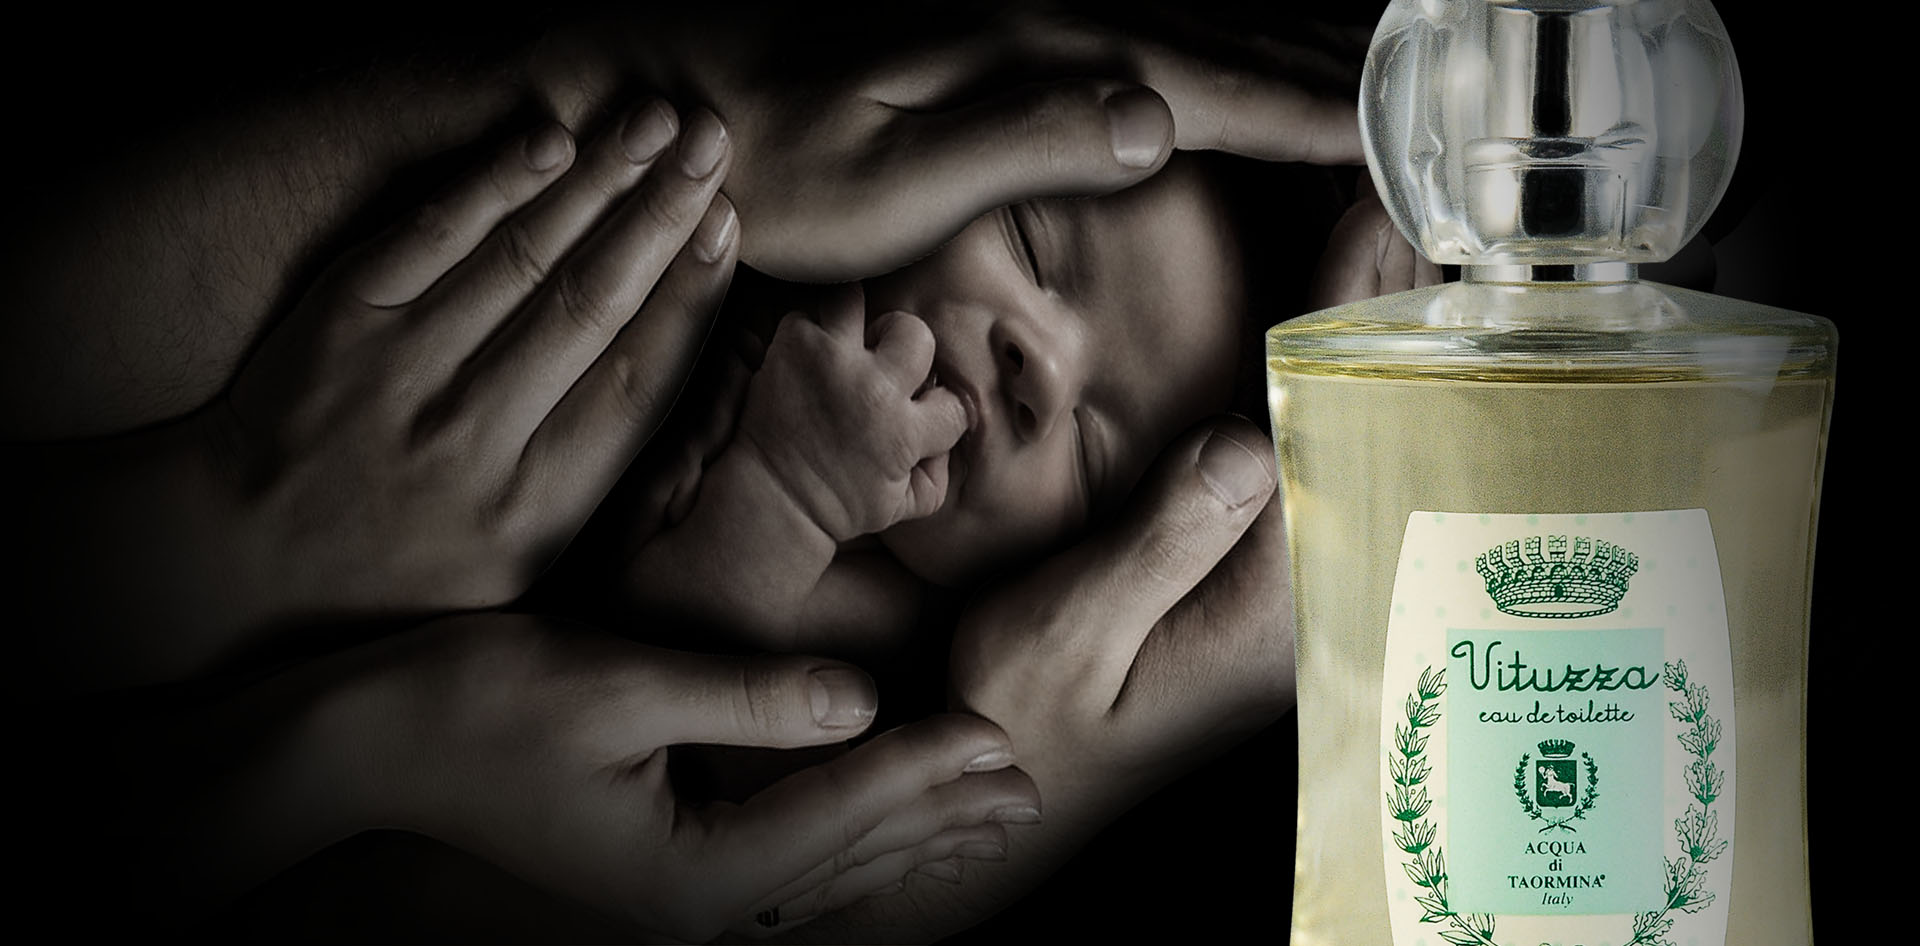 Acqua di Taormina parfums adt_vituzza-1 Acqua di Taormina Parfums